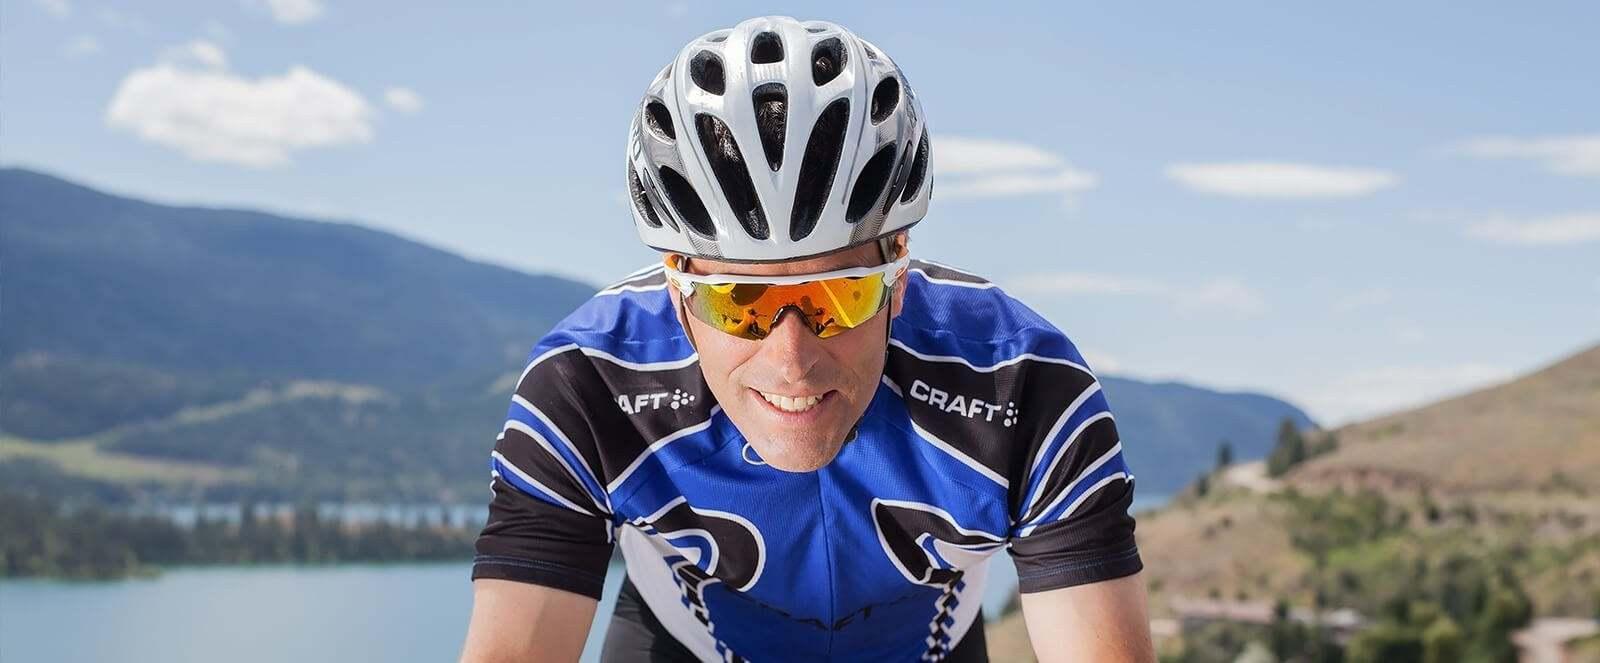 550b9bef9d23 Darren - Nordic Ski Coach Cycling at Kal Lookout wearing OAKLEY